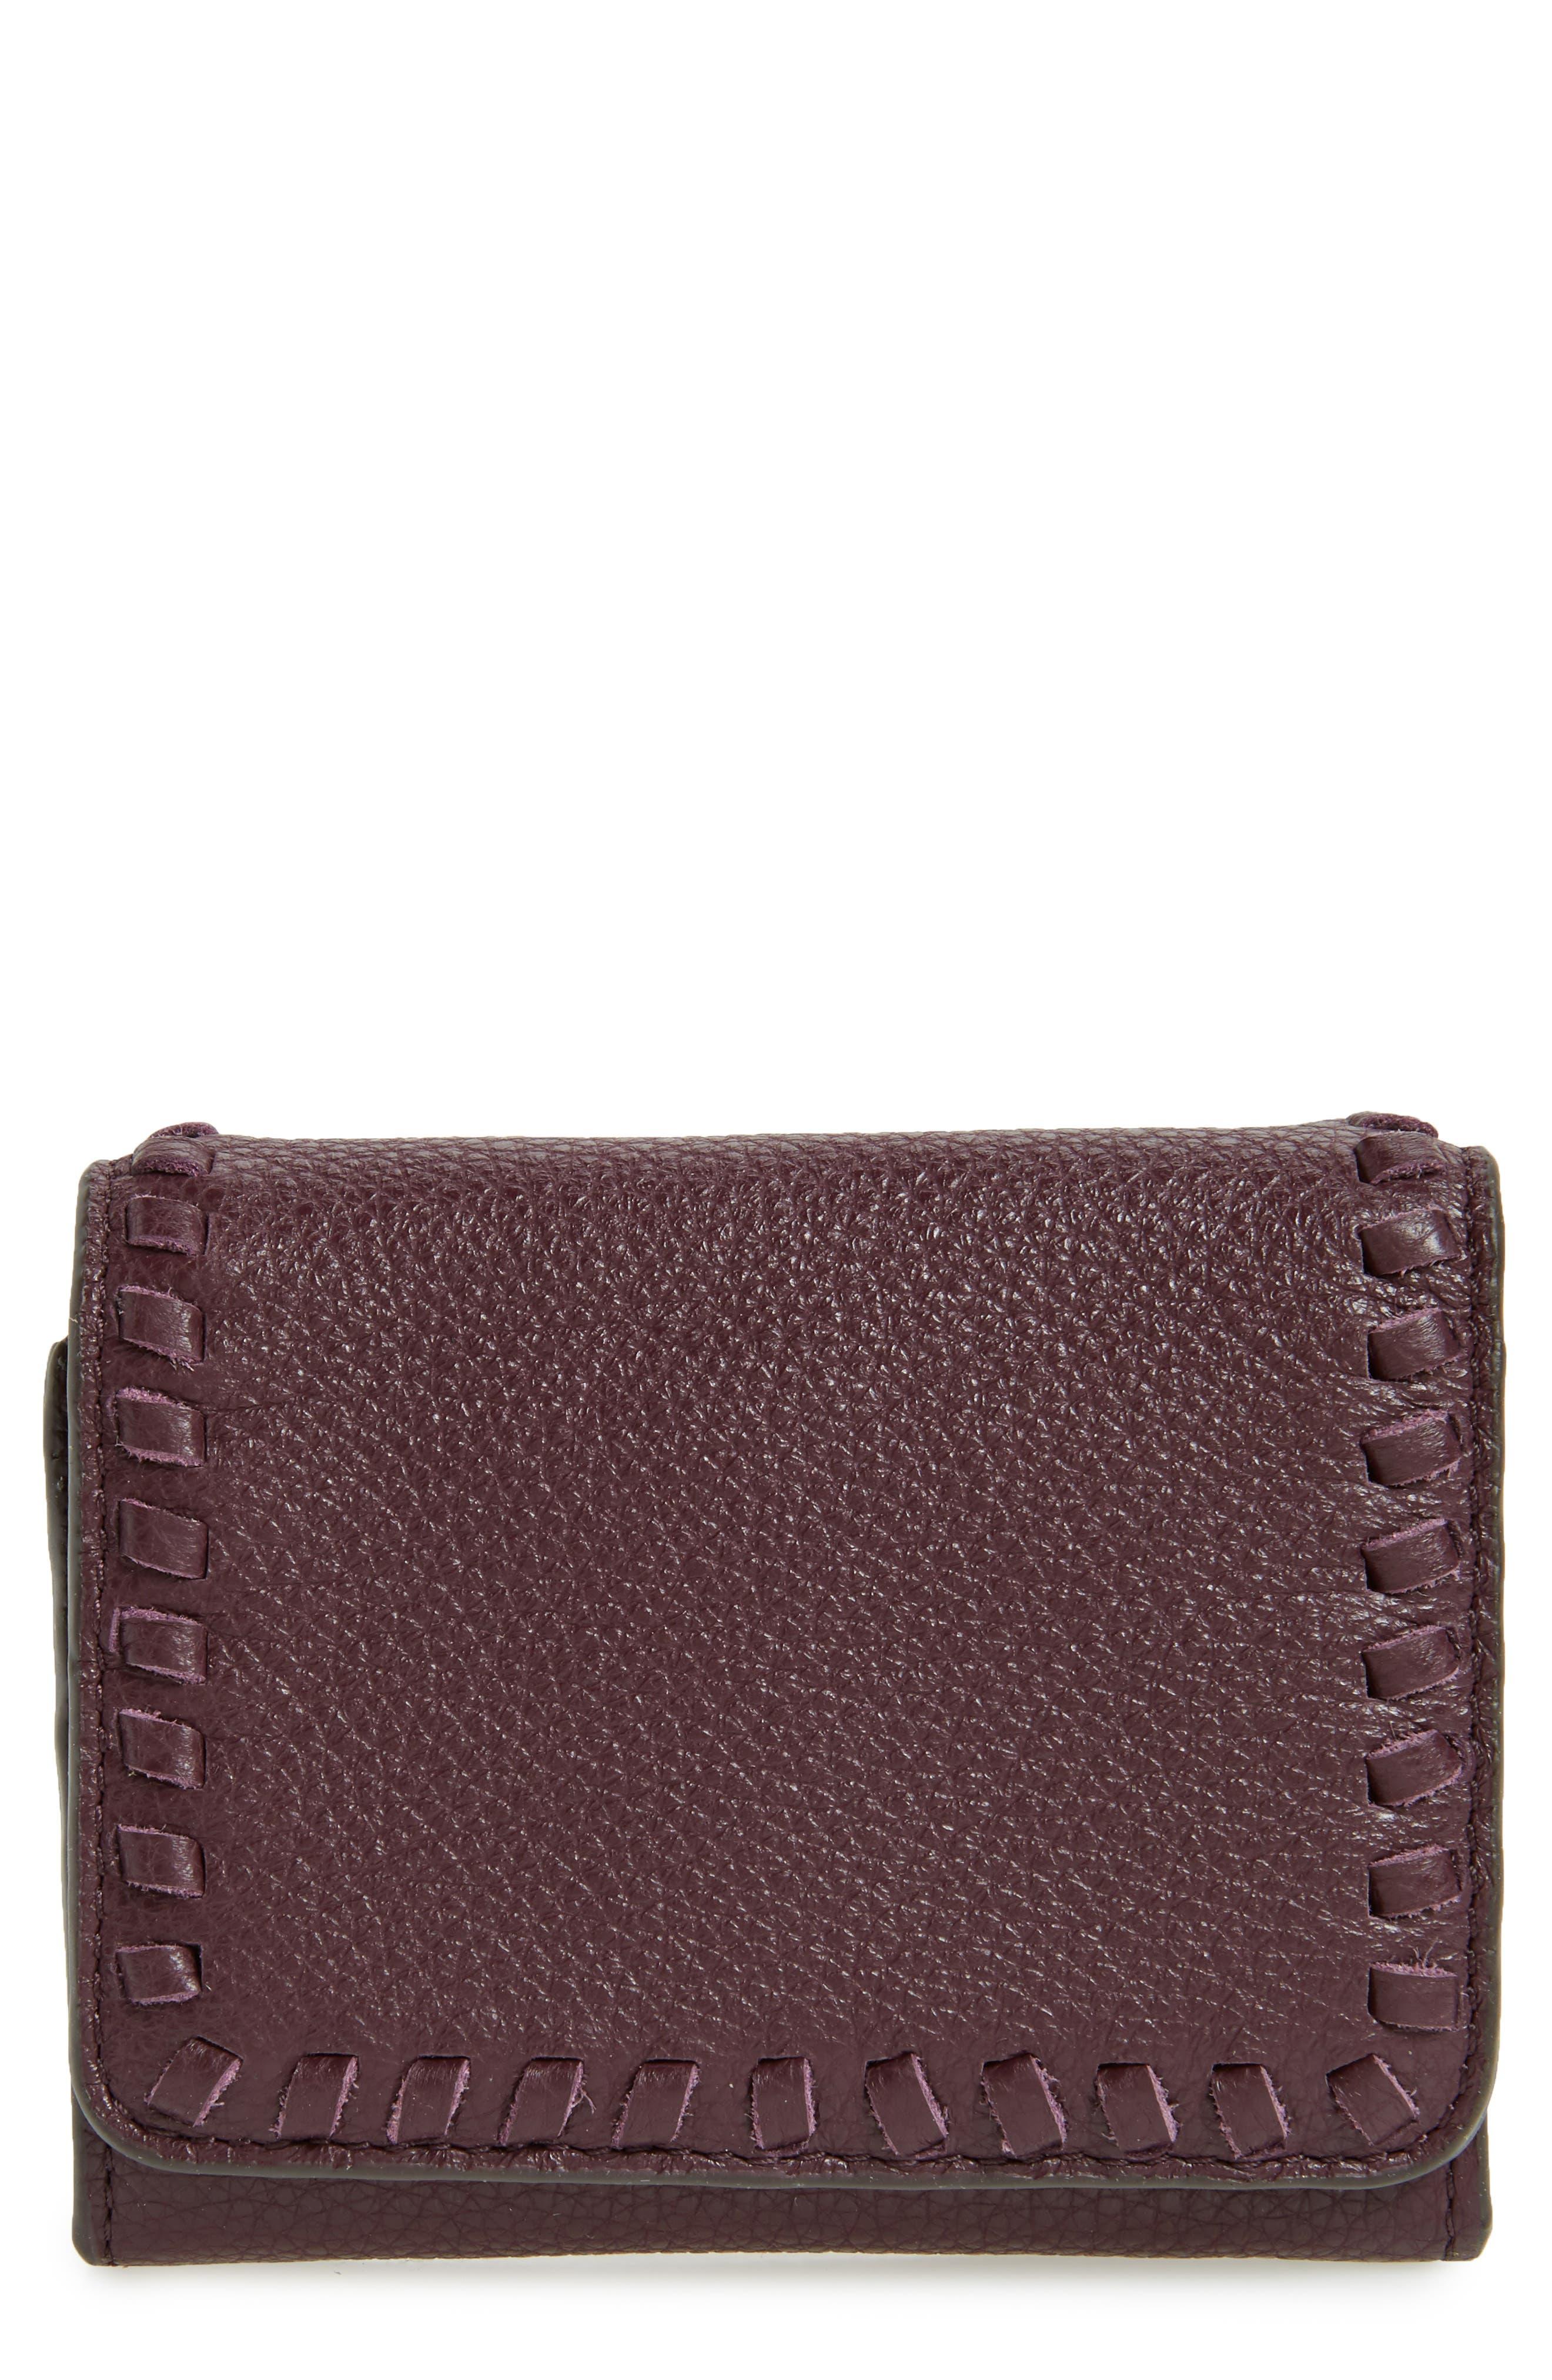 Rebecca Minkoff Mini Vanity Leather Wallet